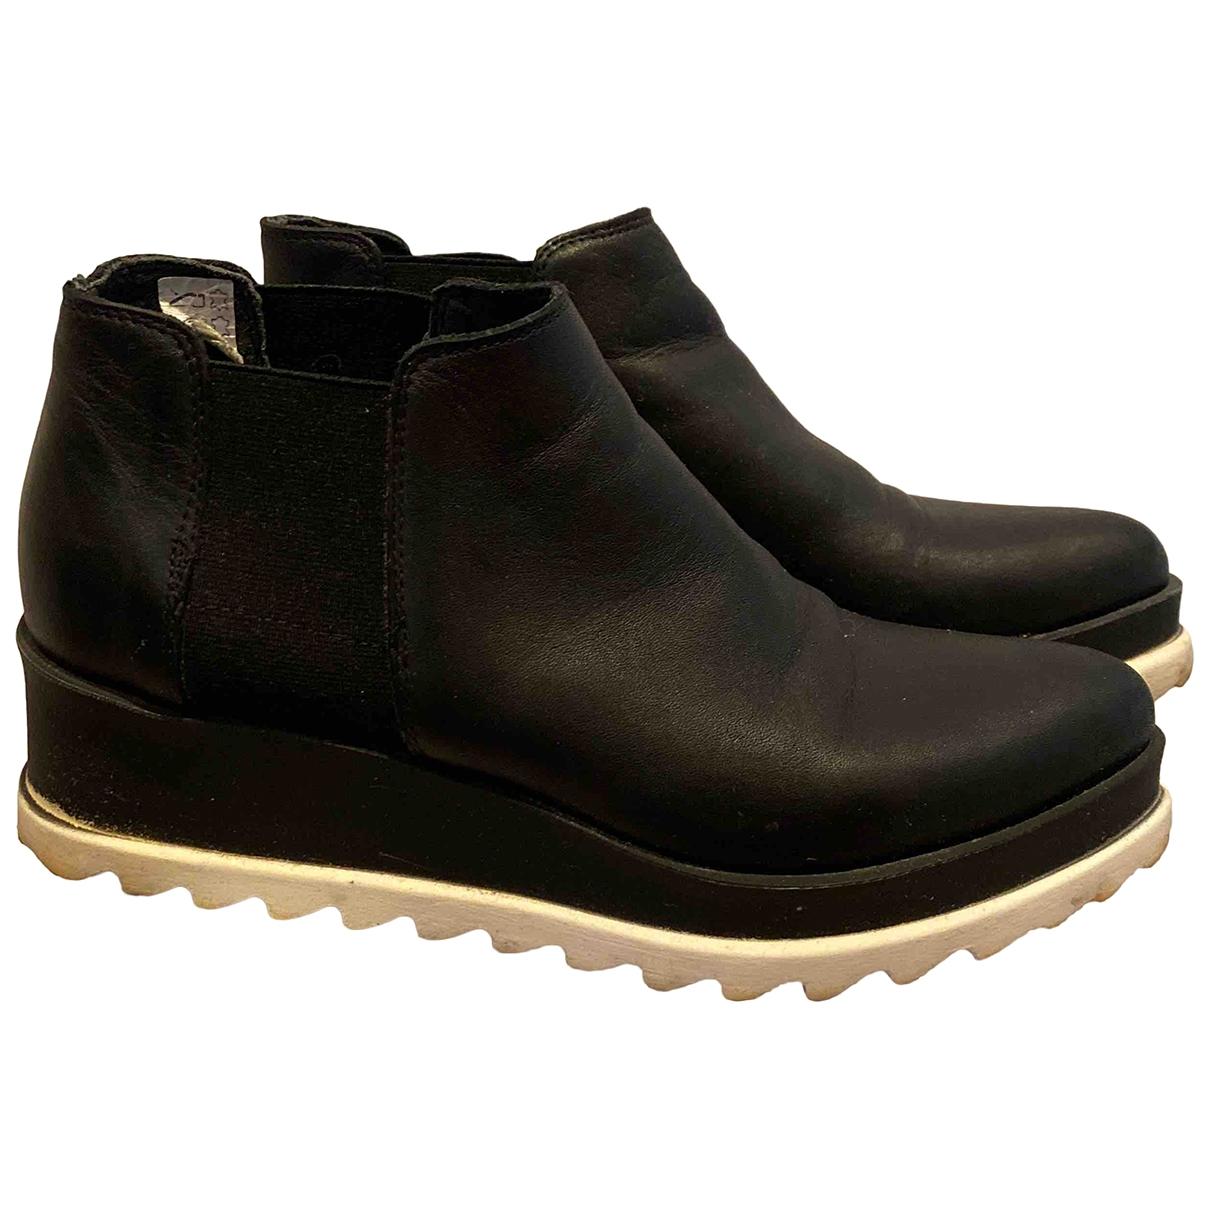 Ovye \N Stiefel in  Schwarz Leder